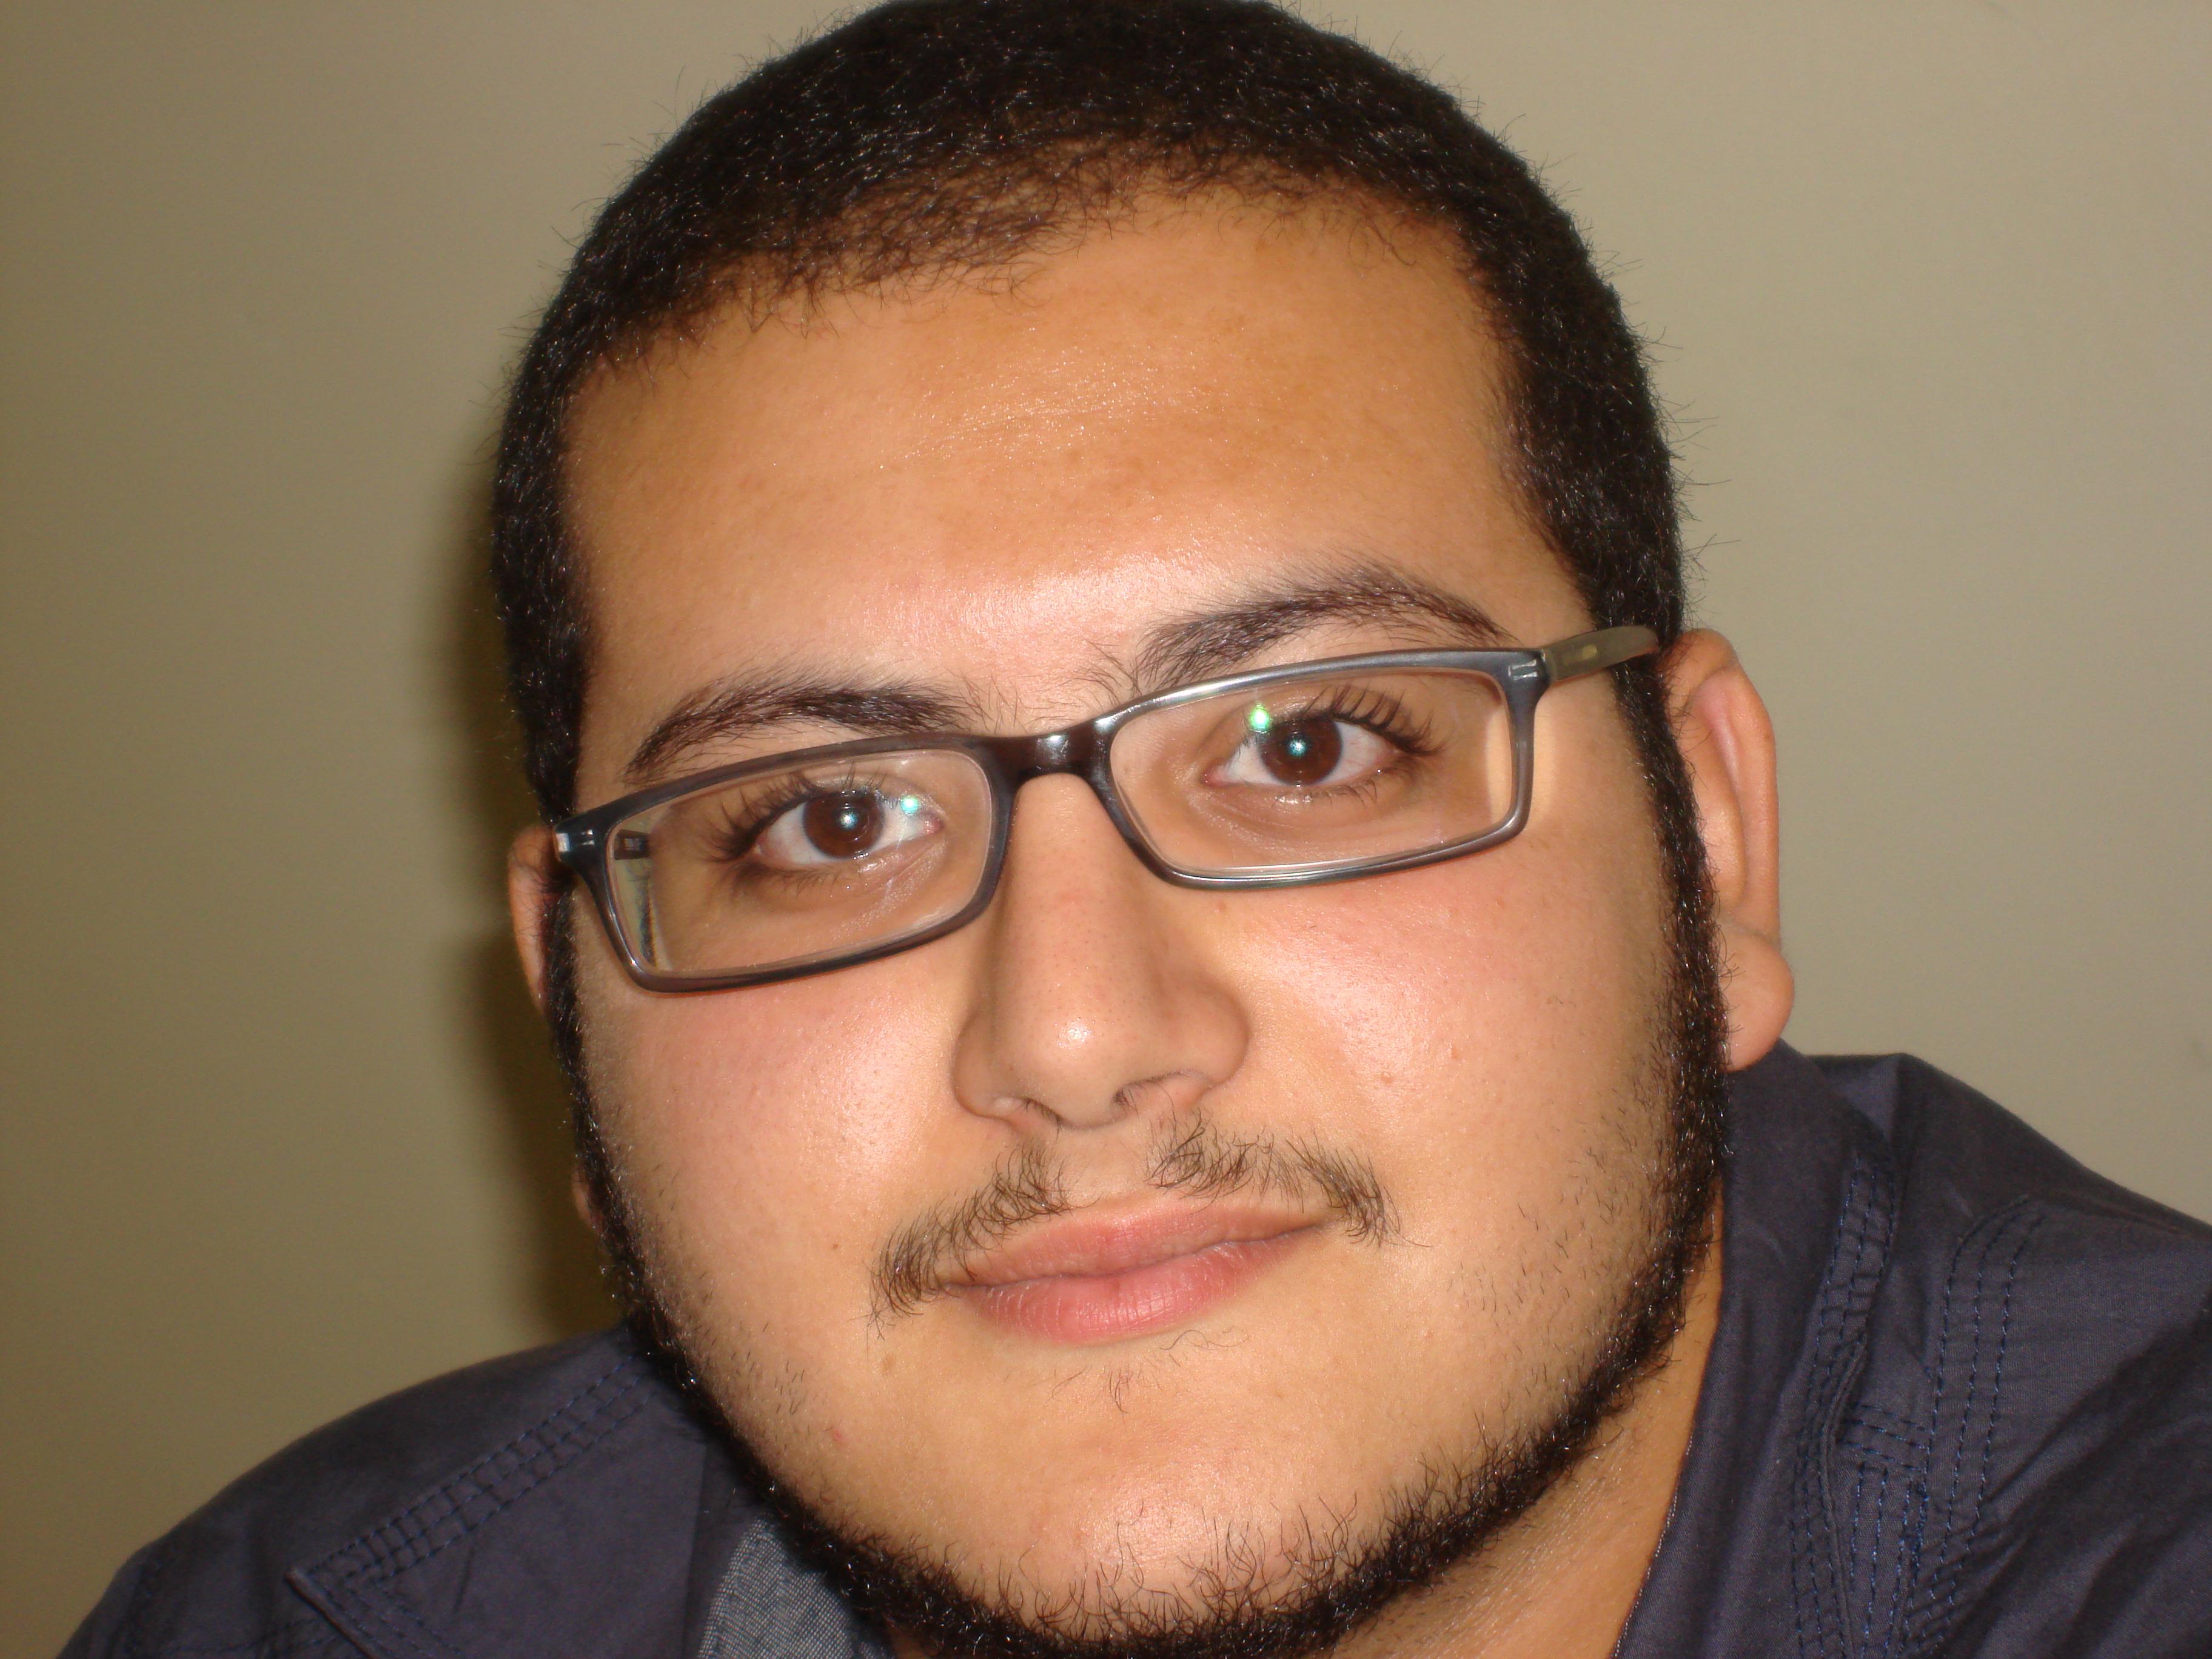 Habibi, Yassine